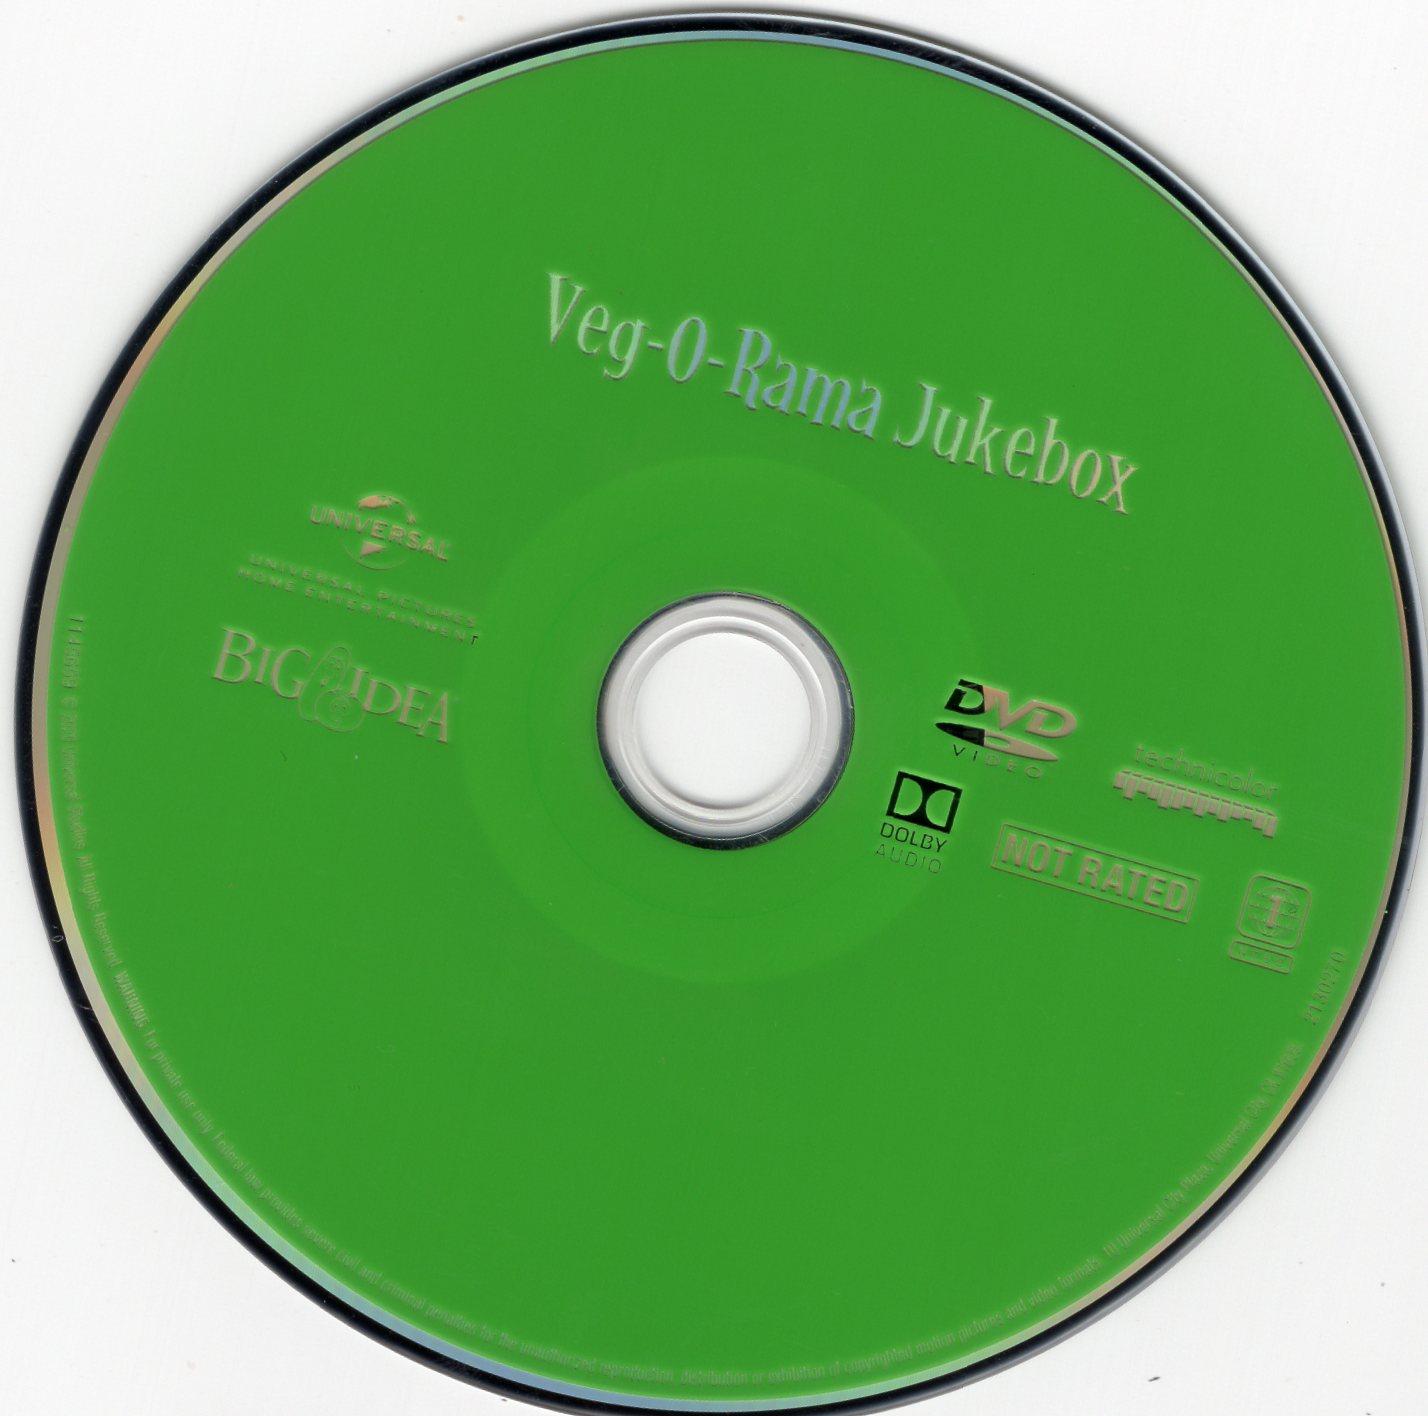 Veg-O-Rama Jukebox